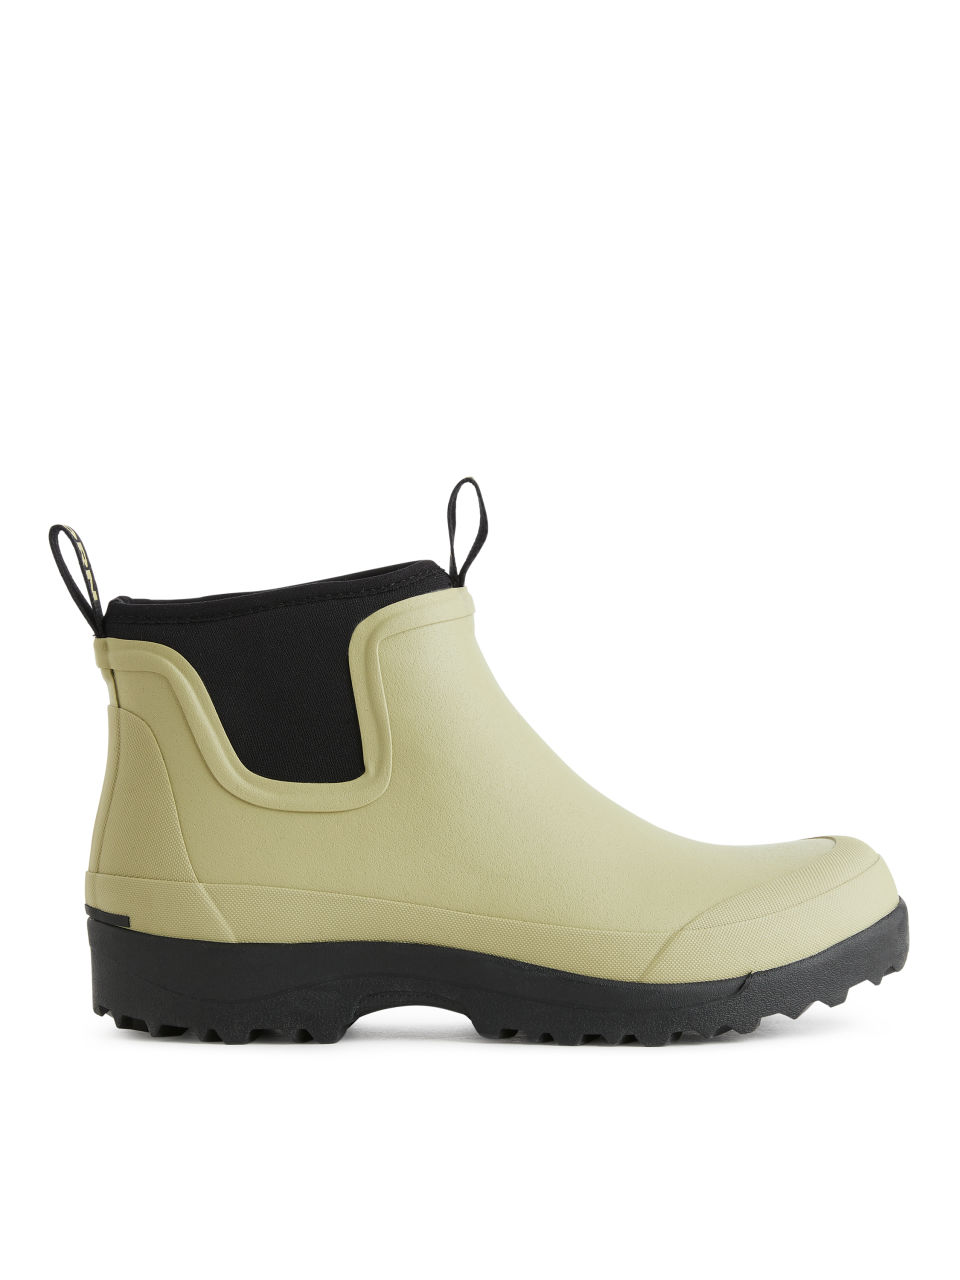 Tretorn Terräng Rubber Boots - Yellow